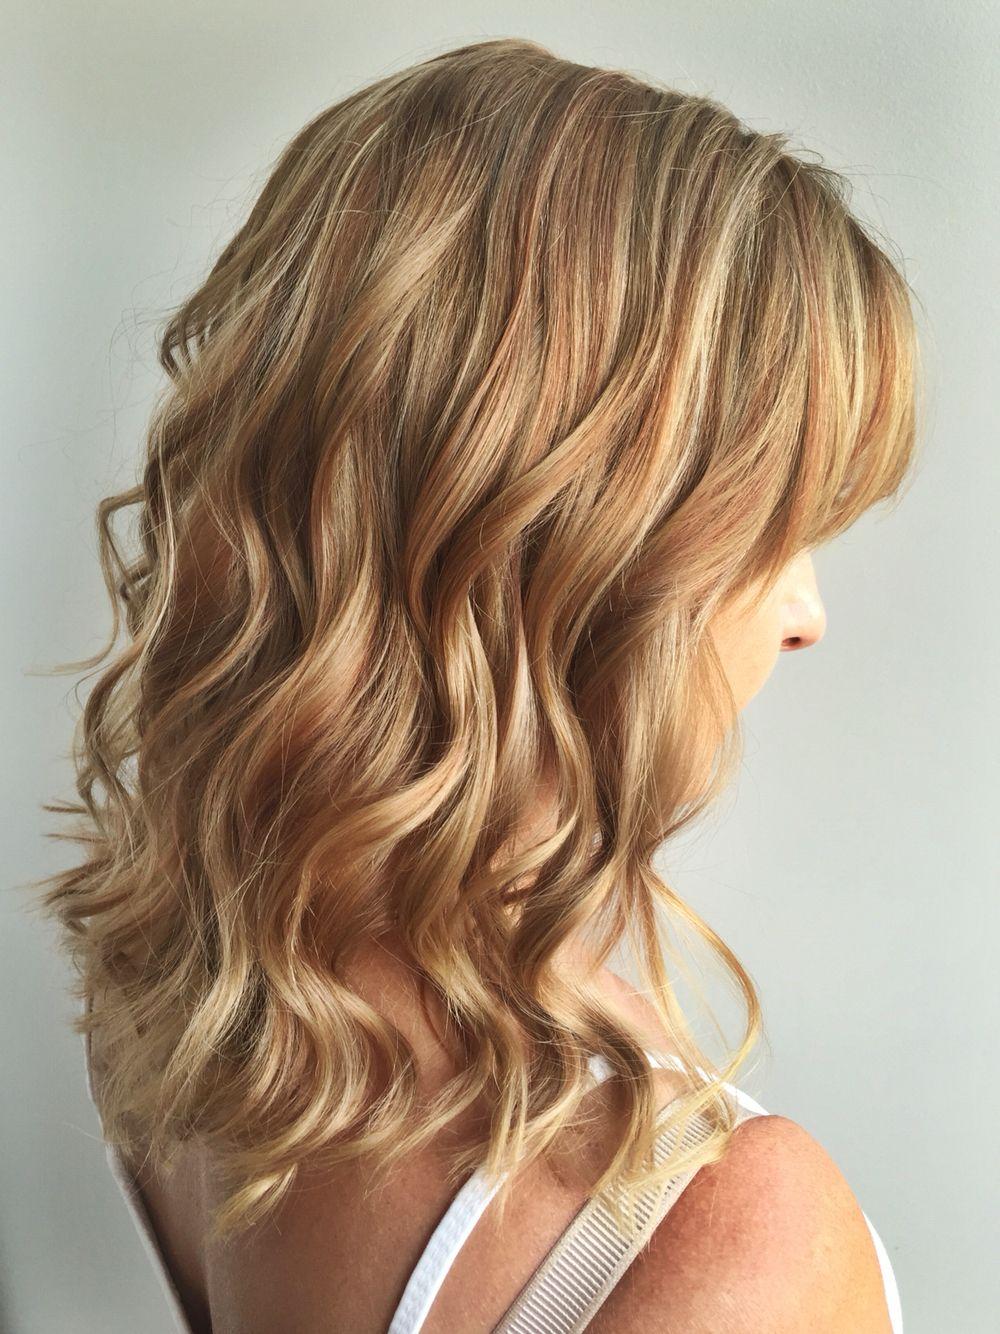 Soft Copper Hair Copper Highlights Warm Blonde Golden Blonde Summery Blonde Warm Blonde Blonde Hair With Highlights Copper Hair